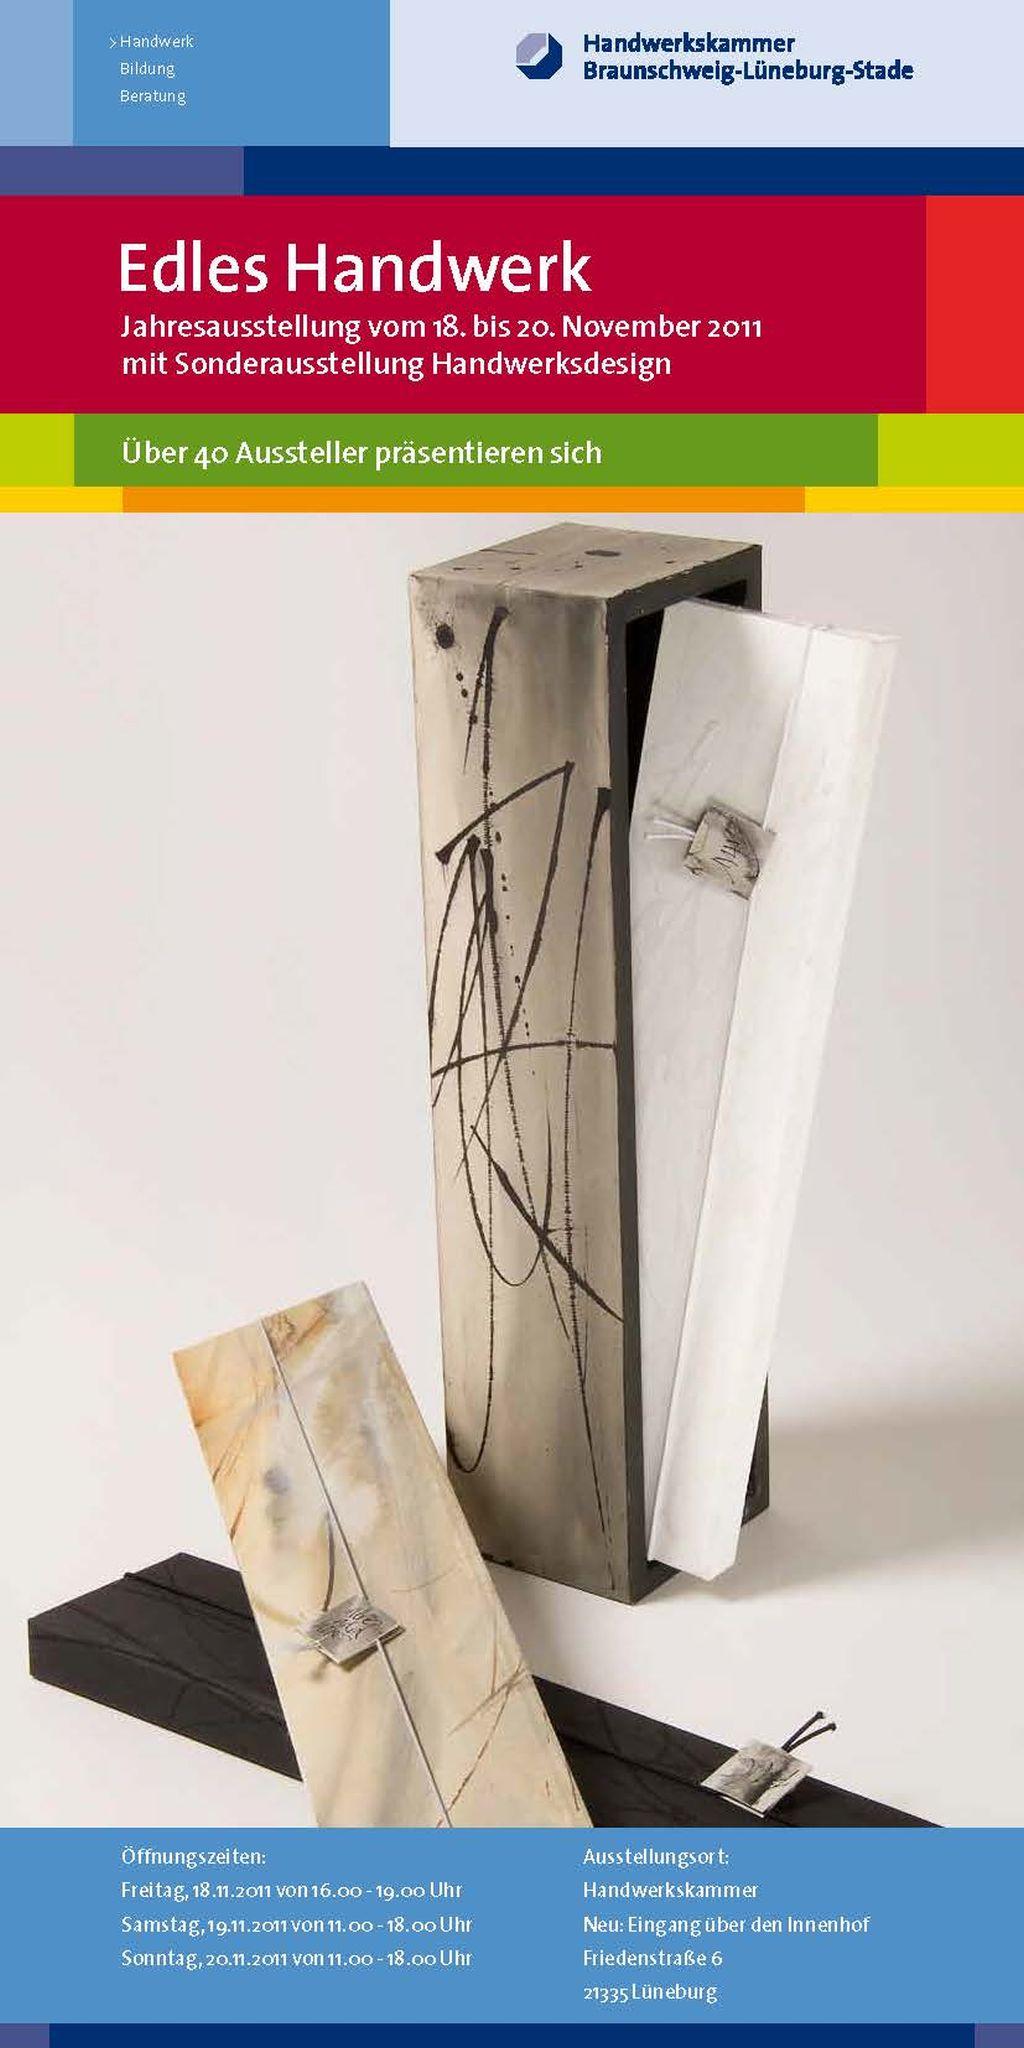 Sonderausstellung 2012 Handwerksdesign - Flyer Edles Handwerk Front